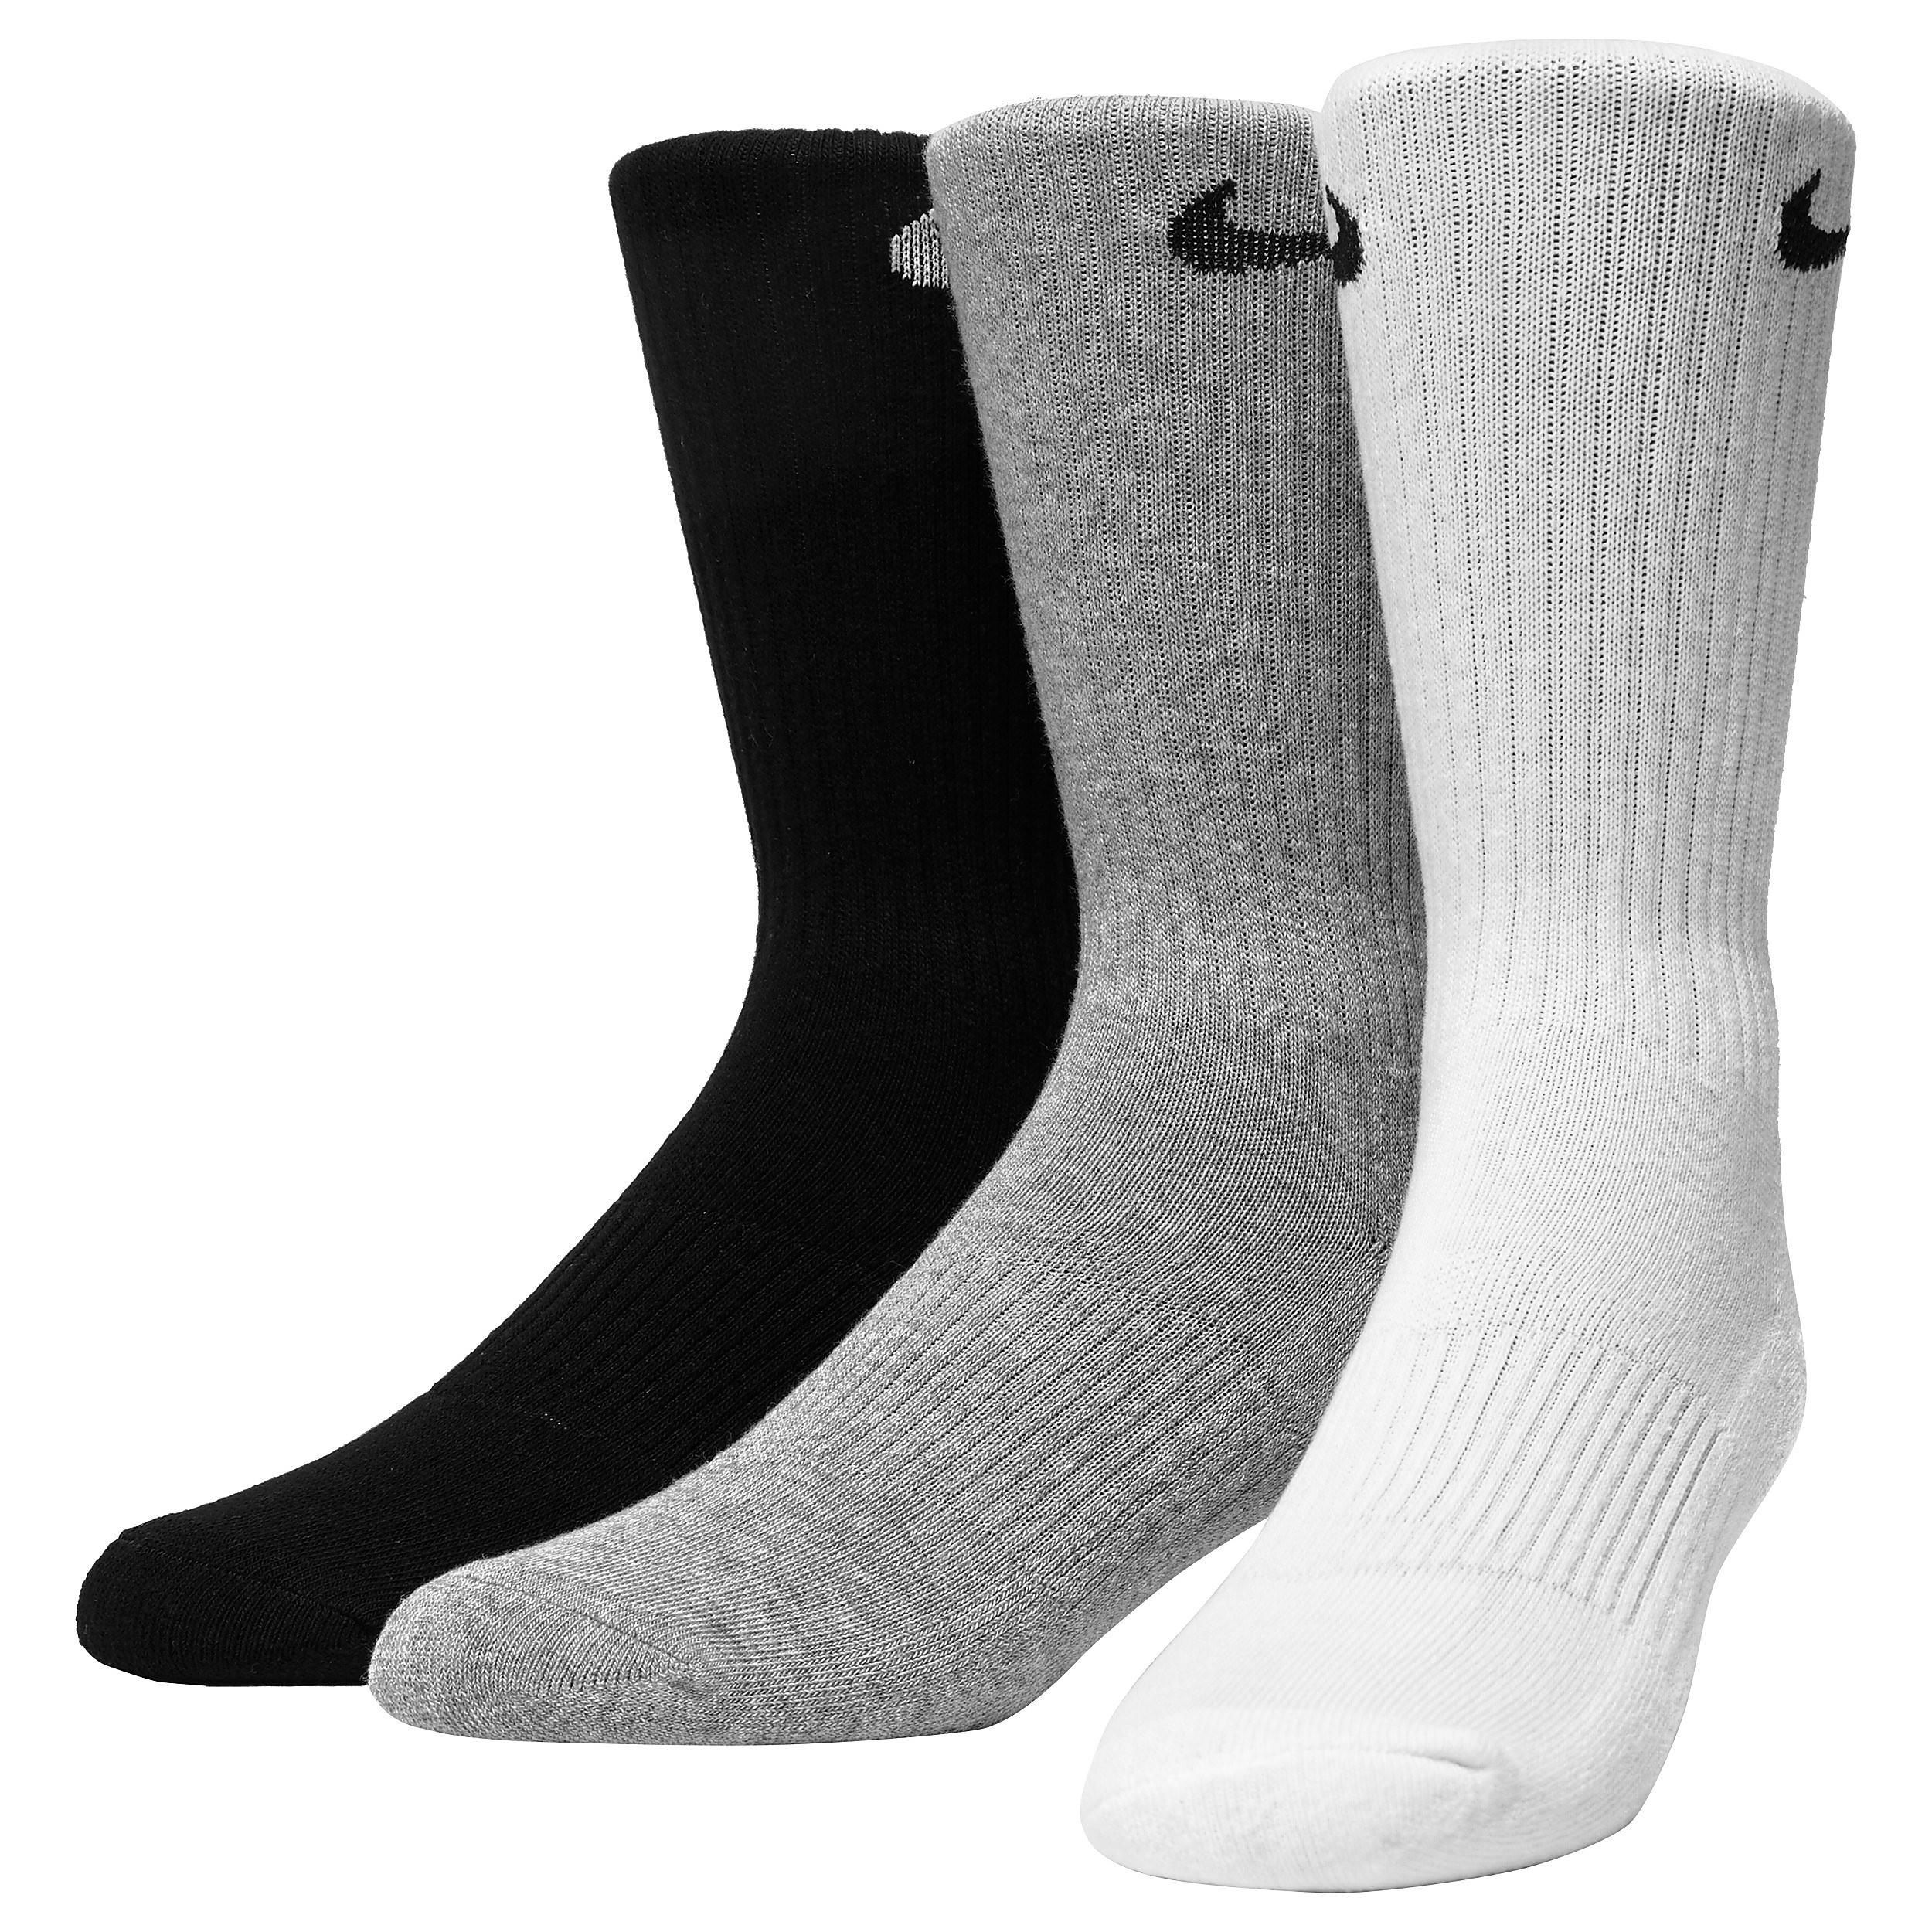 Nike 3 Pack Dri-FIT Cushion Crew Socks